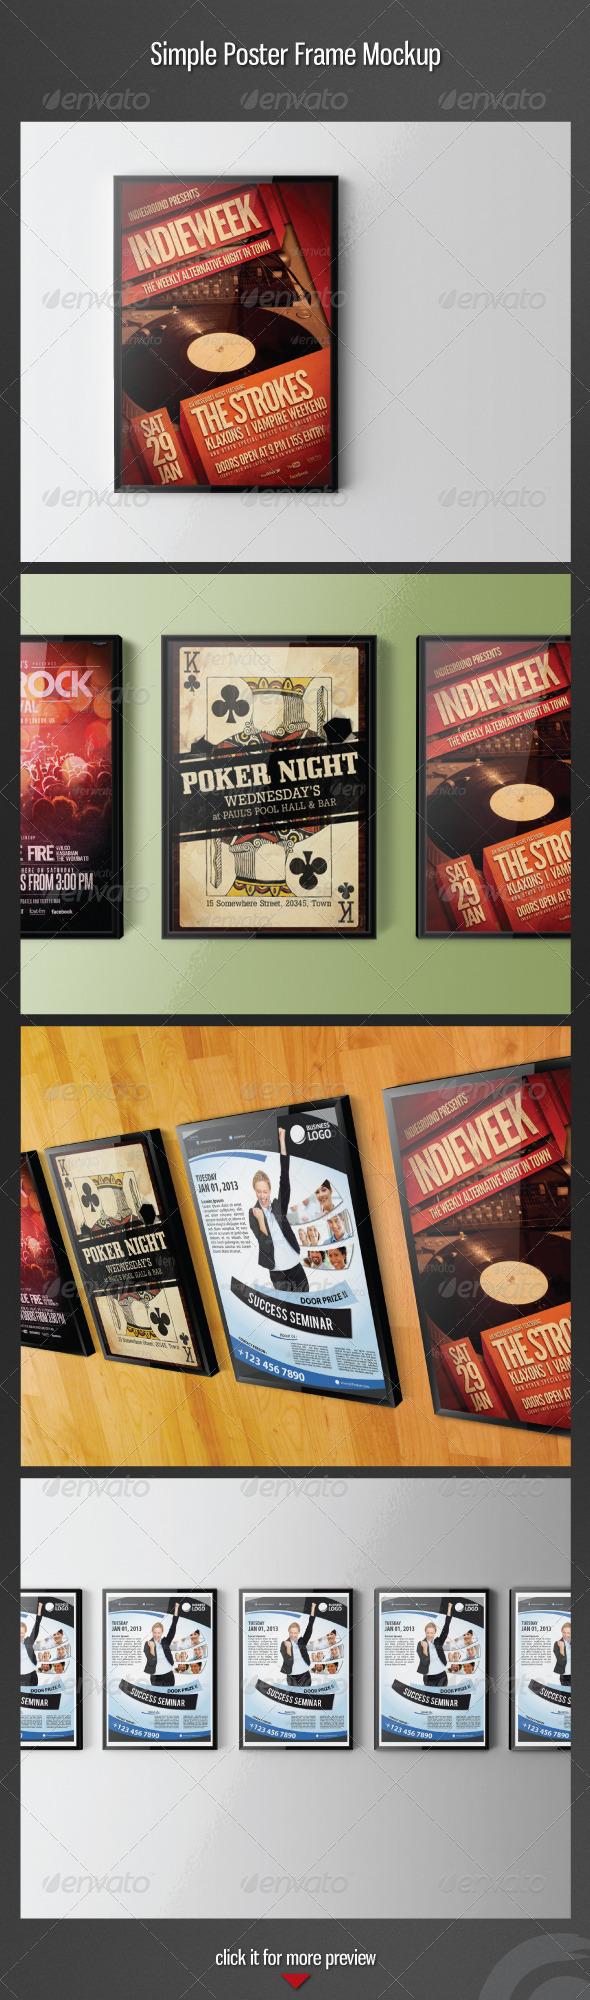 Simple Poster Frame Mockup - Posters Print